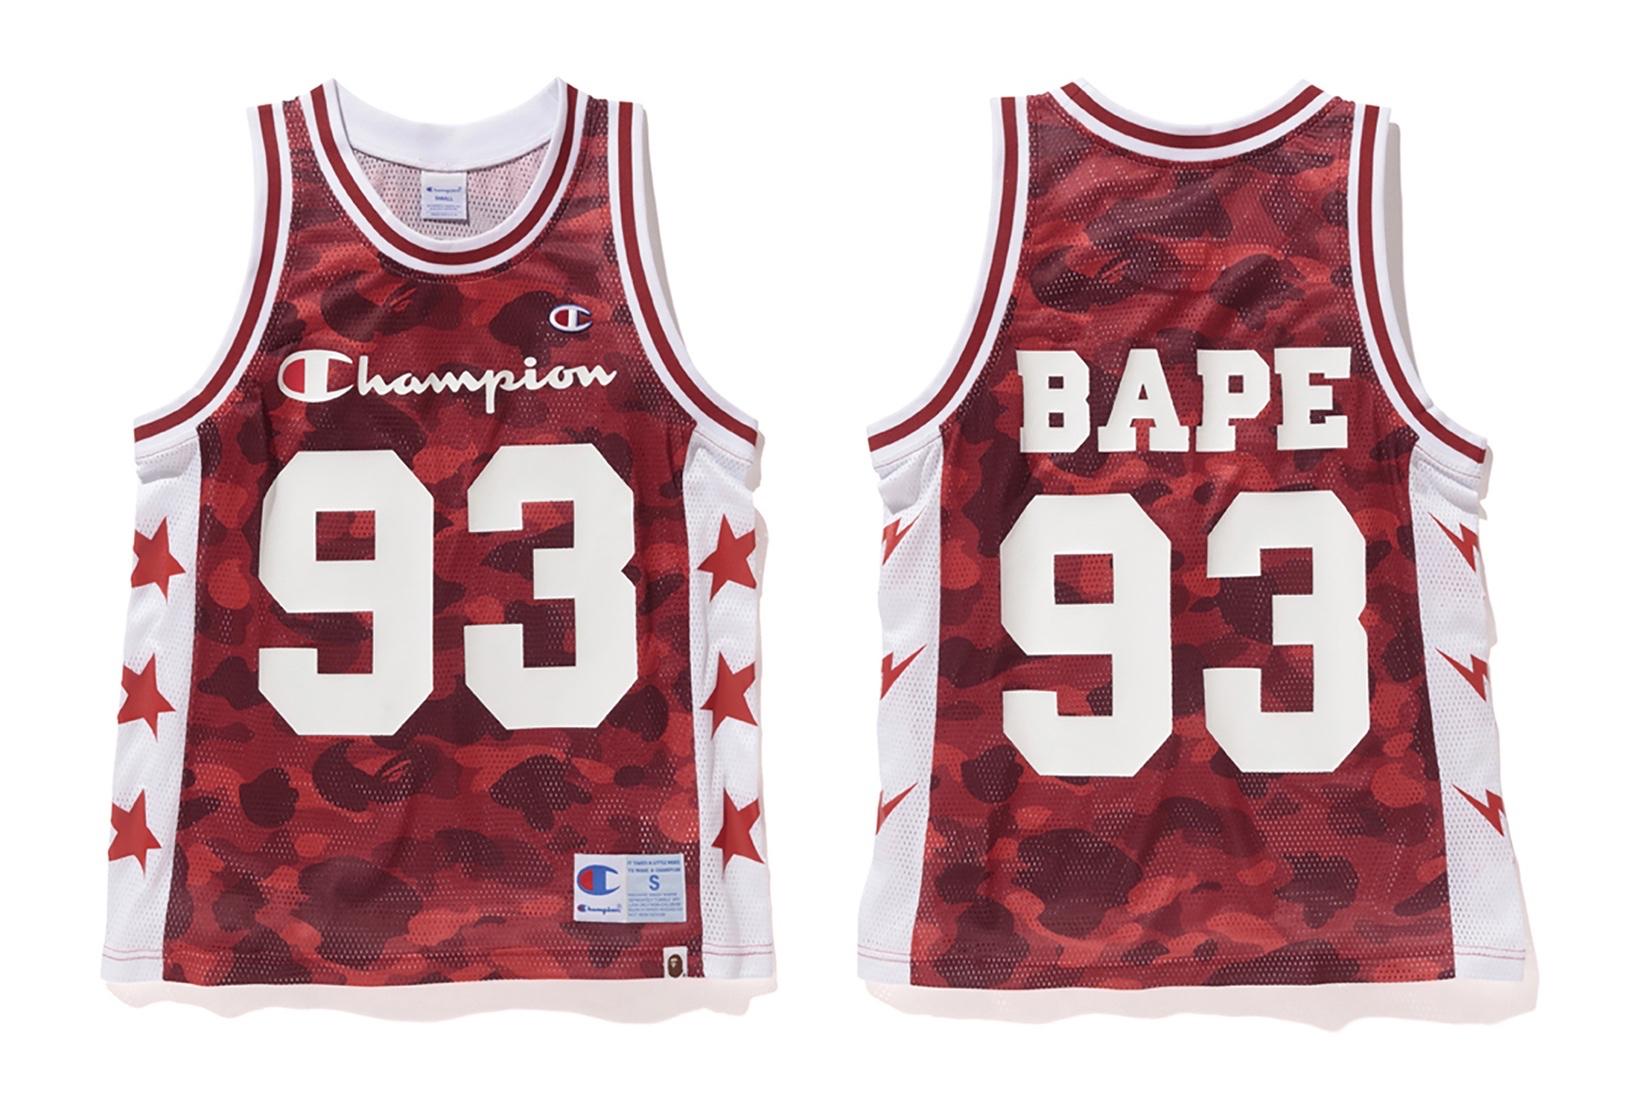 http---bae.hypebeast.com-files-2017-04-Bape-X-Champion-SS-2017-010